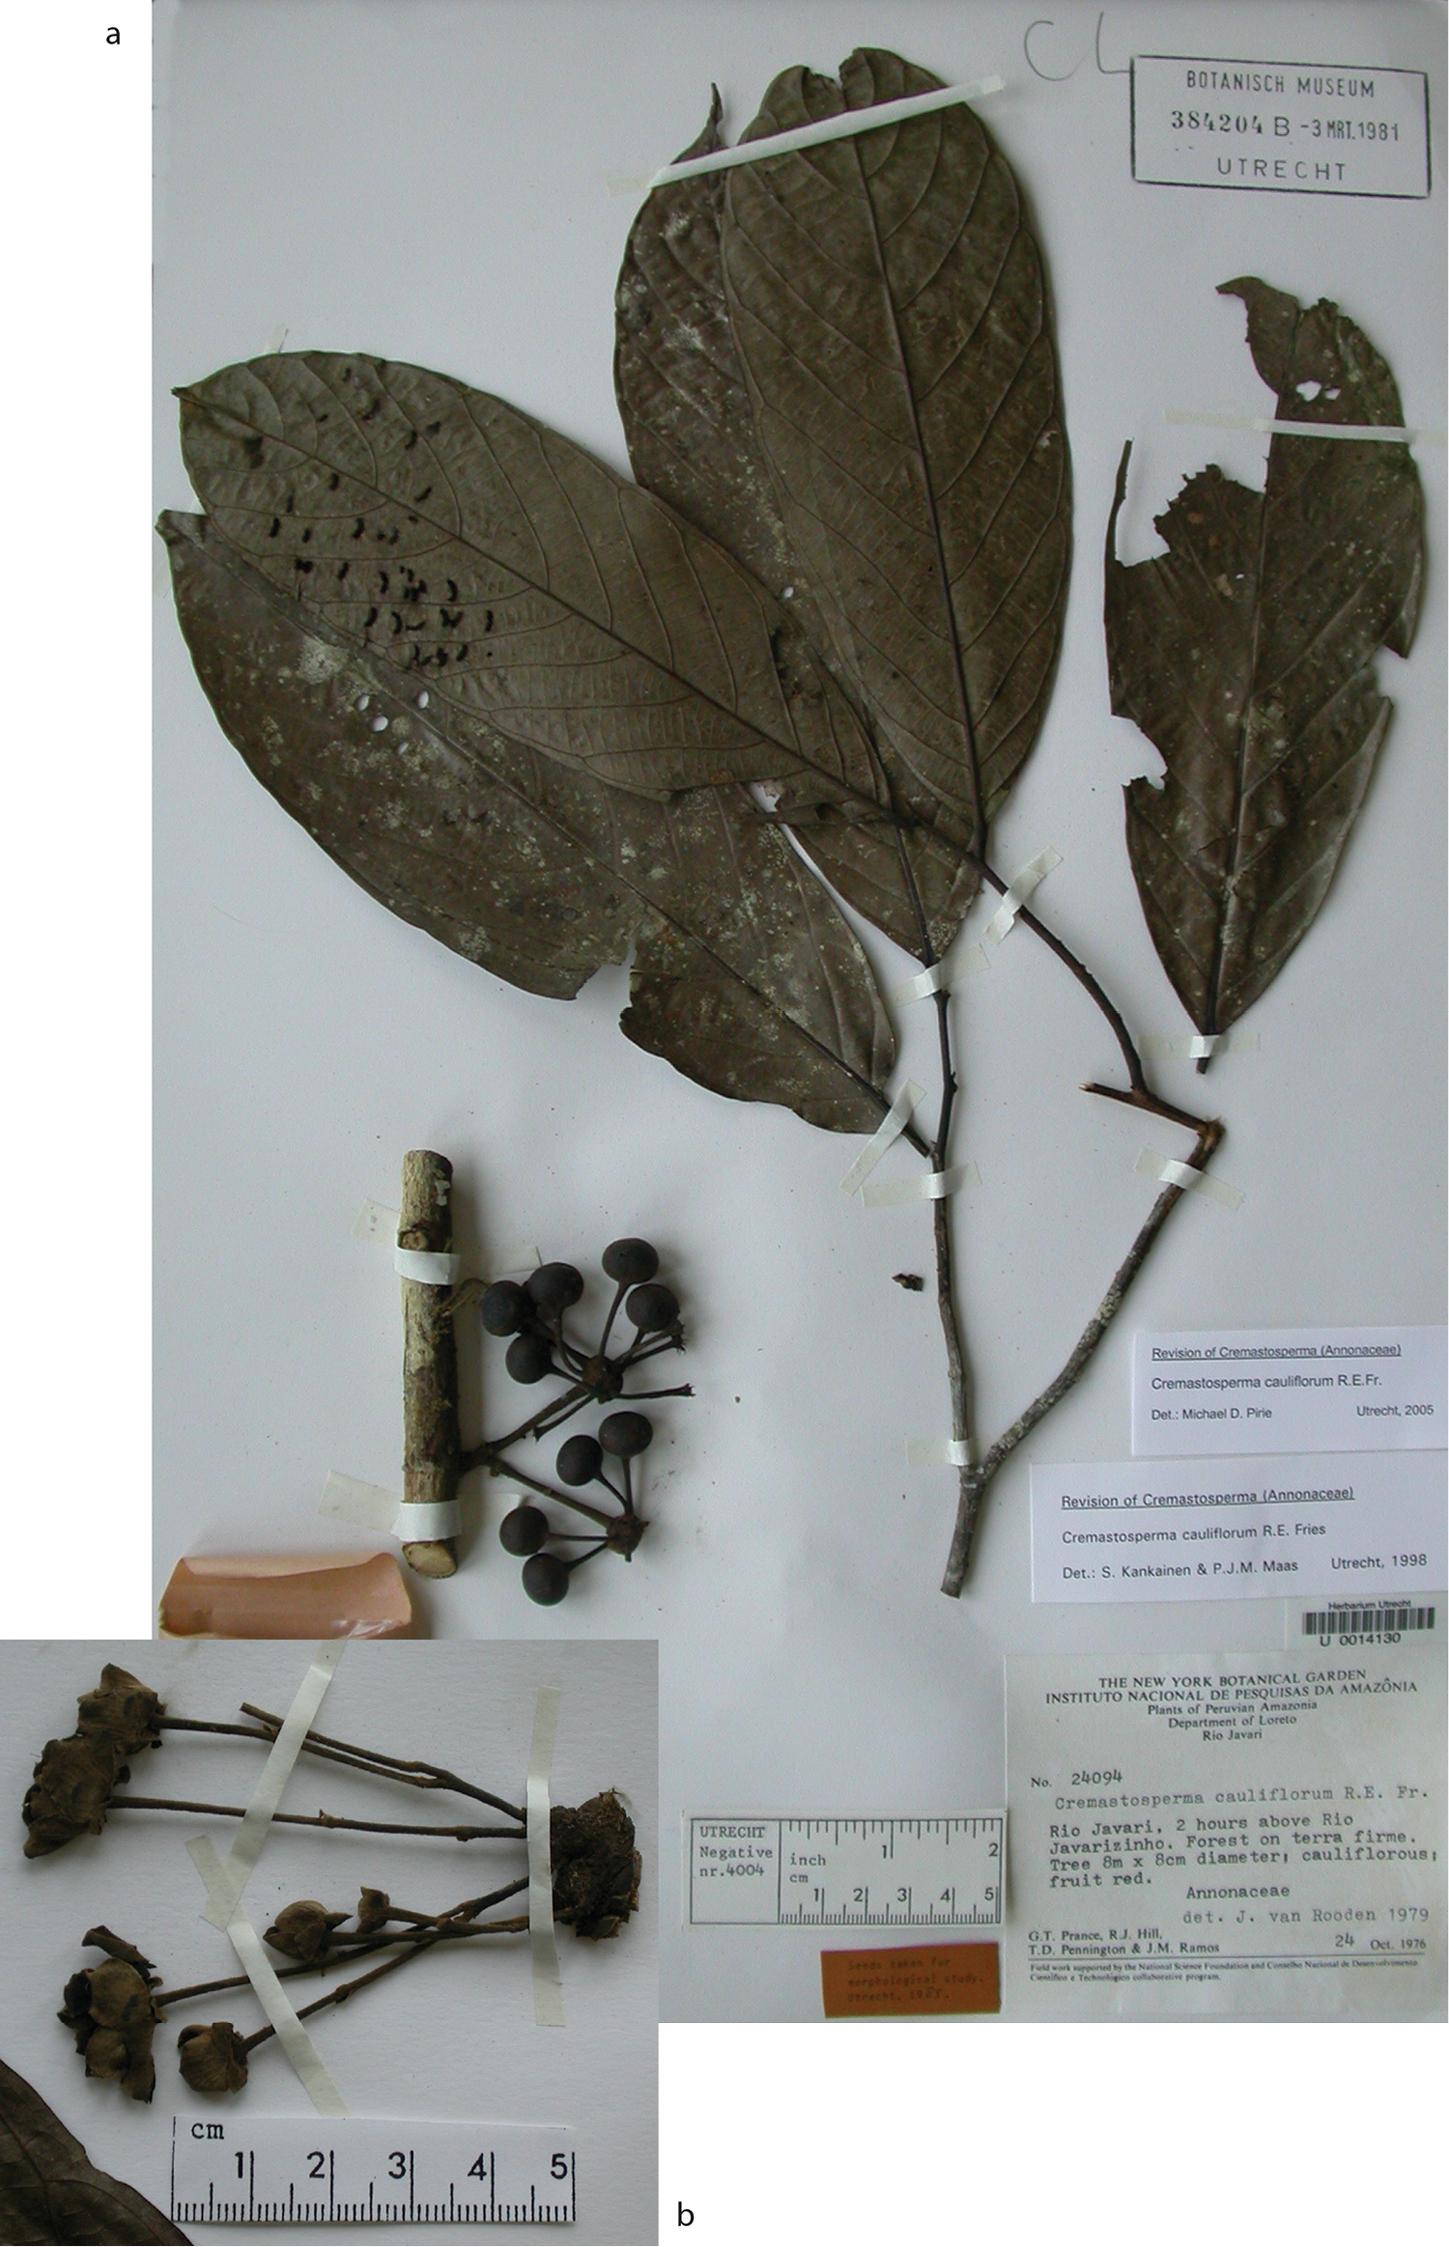 A taxonomic revision of the Neotropical genus Cremastosperma